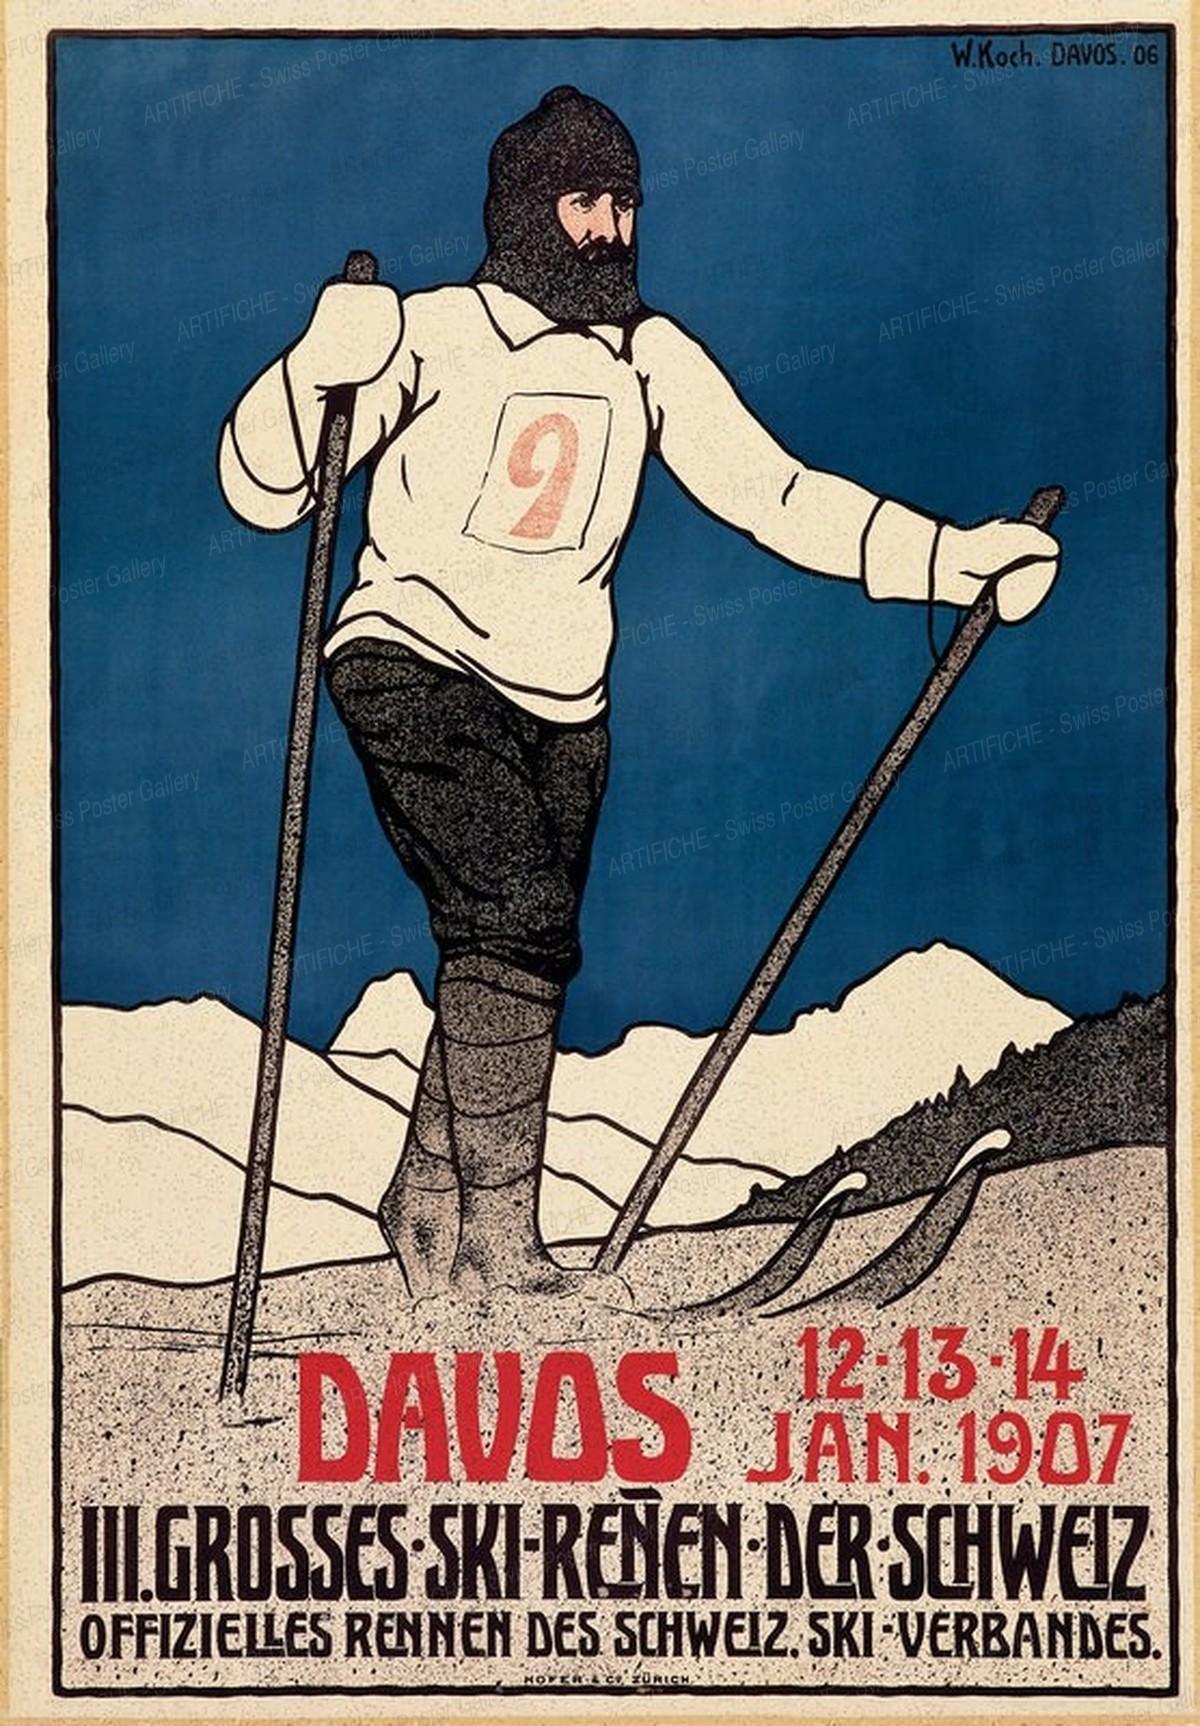 DAVOS – III. Grosses Skirennen der Schweiz 1907, Walther Koch